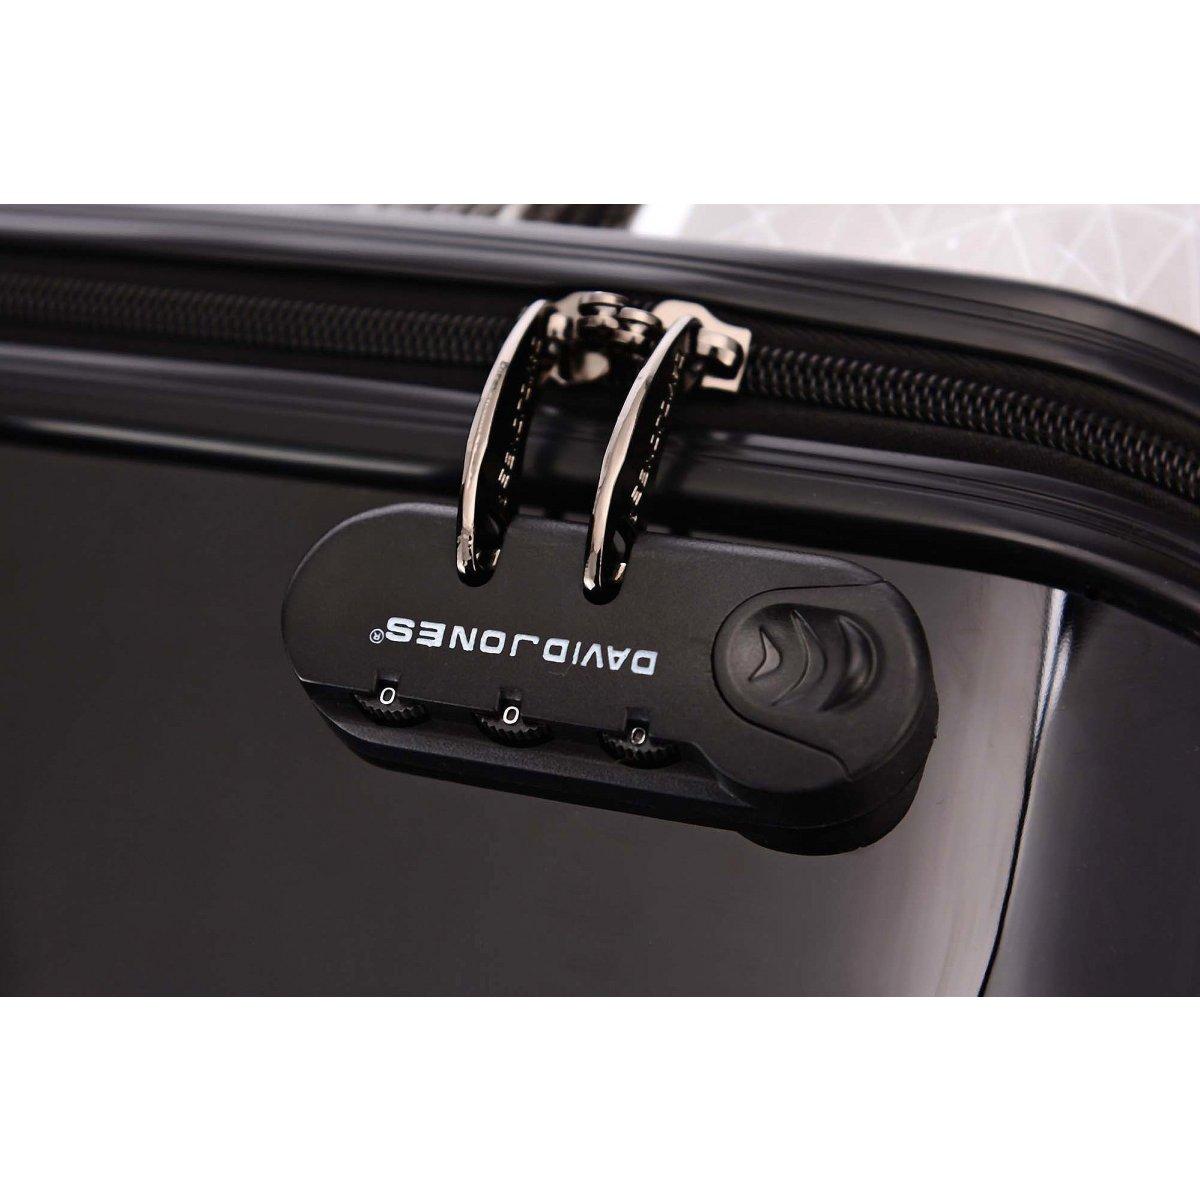 Valise rigide david jones 76cm ba20541g couleur principale brooklyn v - Valise a prix discount ...